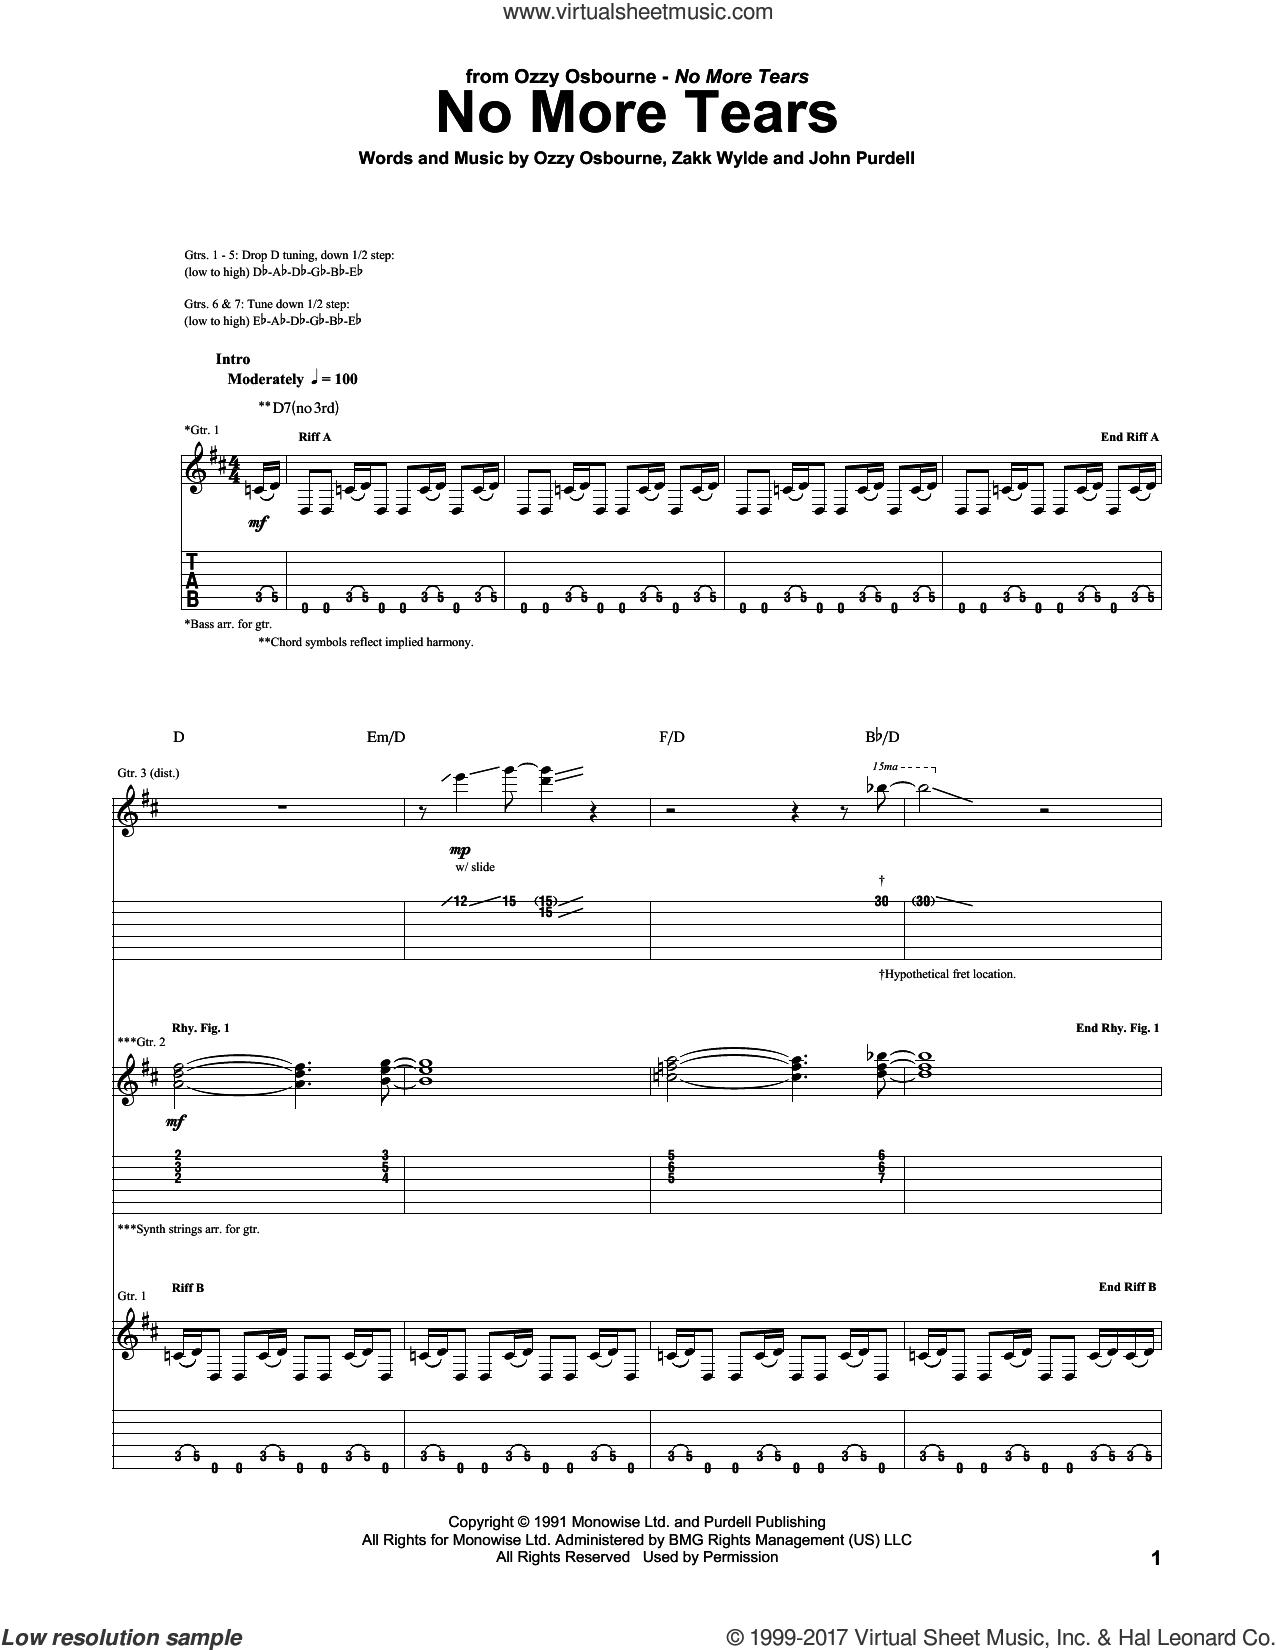 No More Tears sheet music for guitar (tablature) by Ozzy Osbourne, John Purdell and Zakk Wylde, intermediate skill level